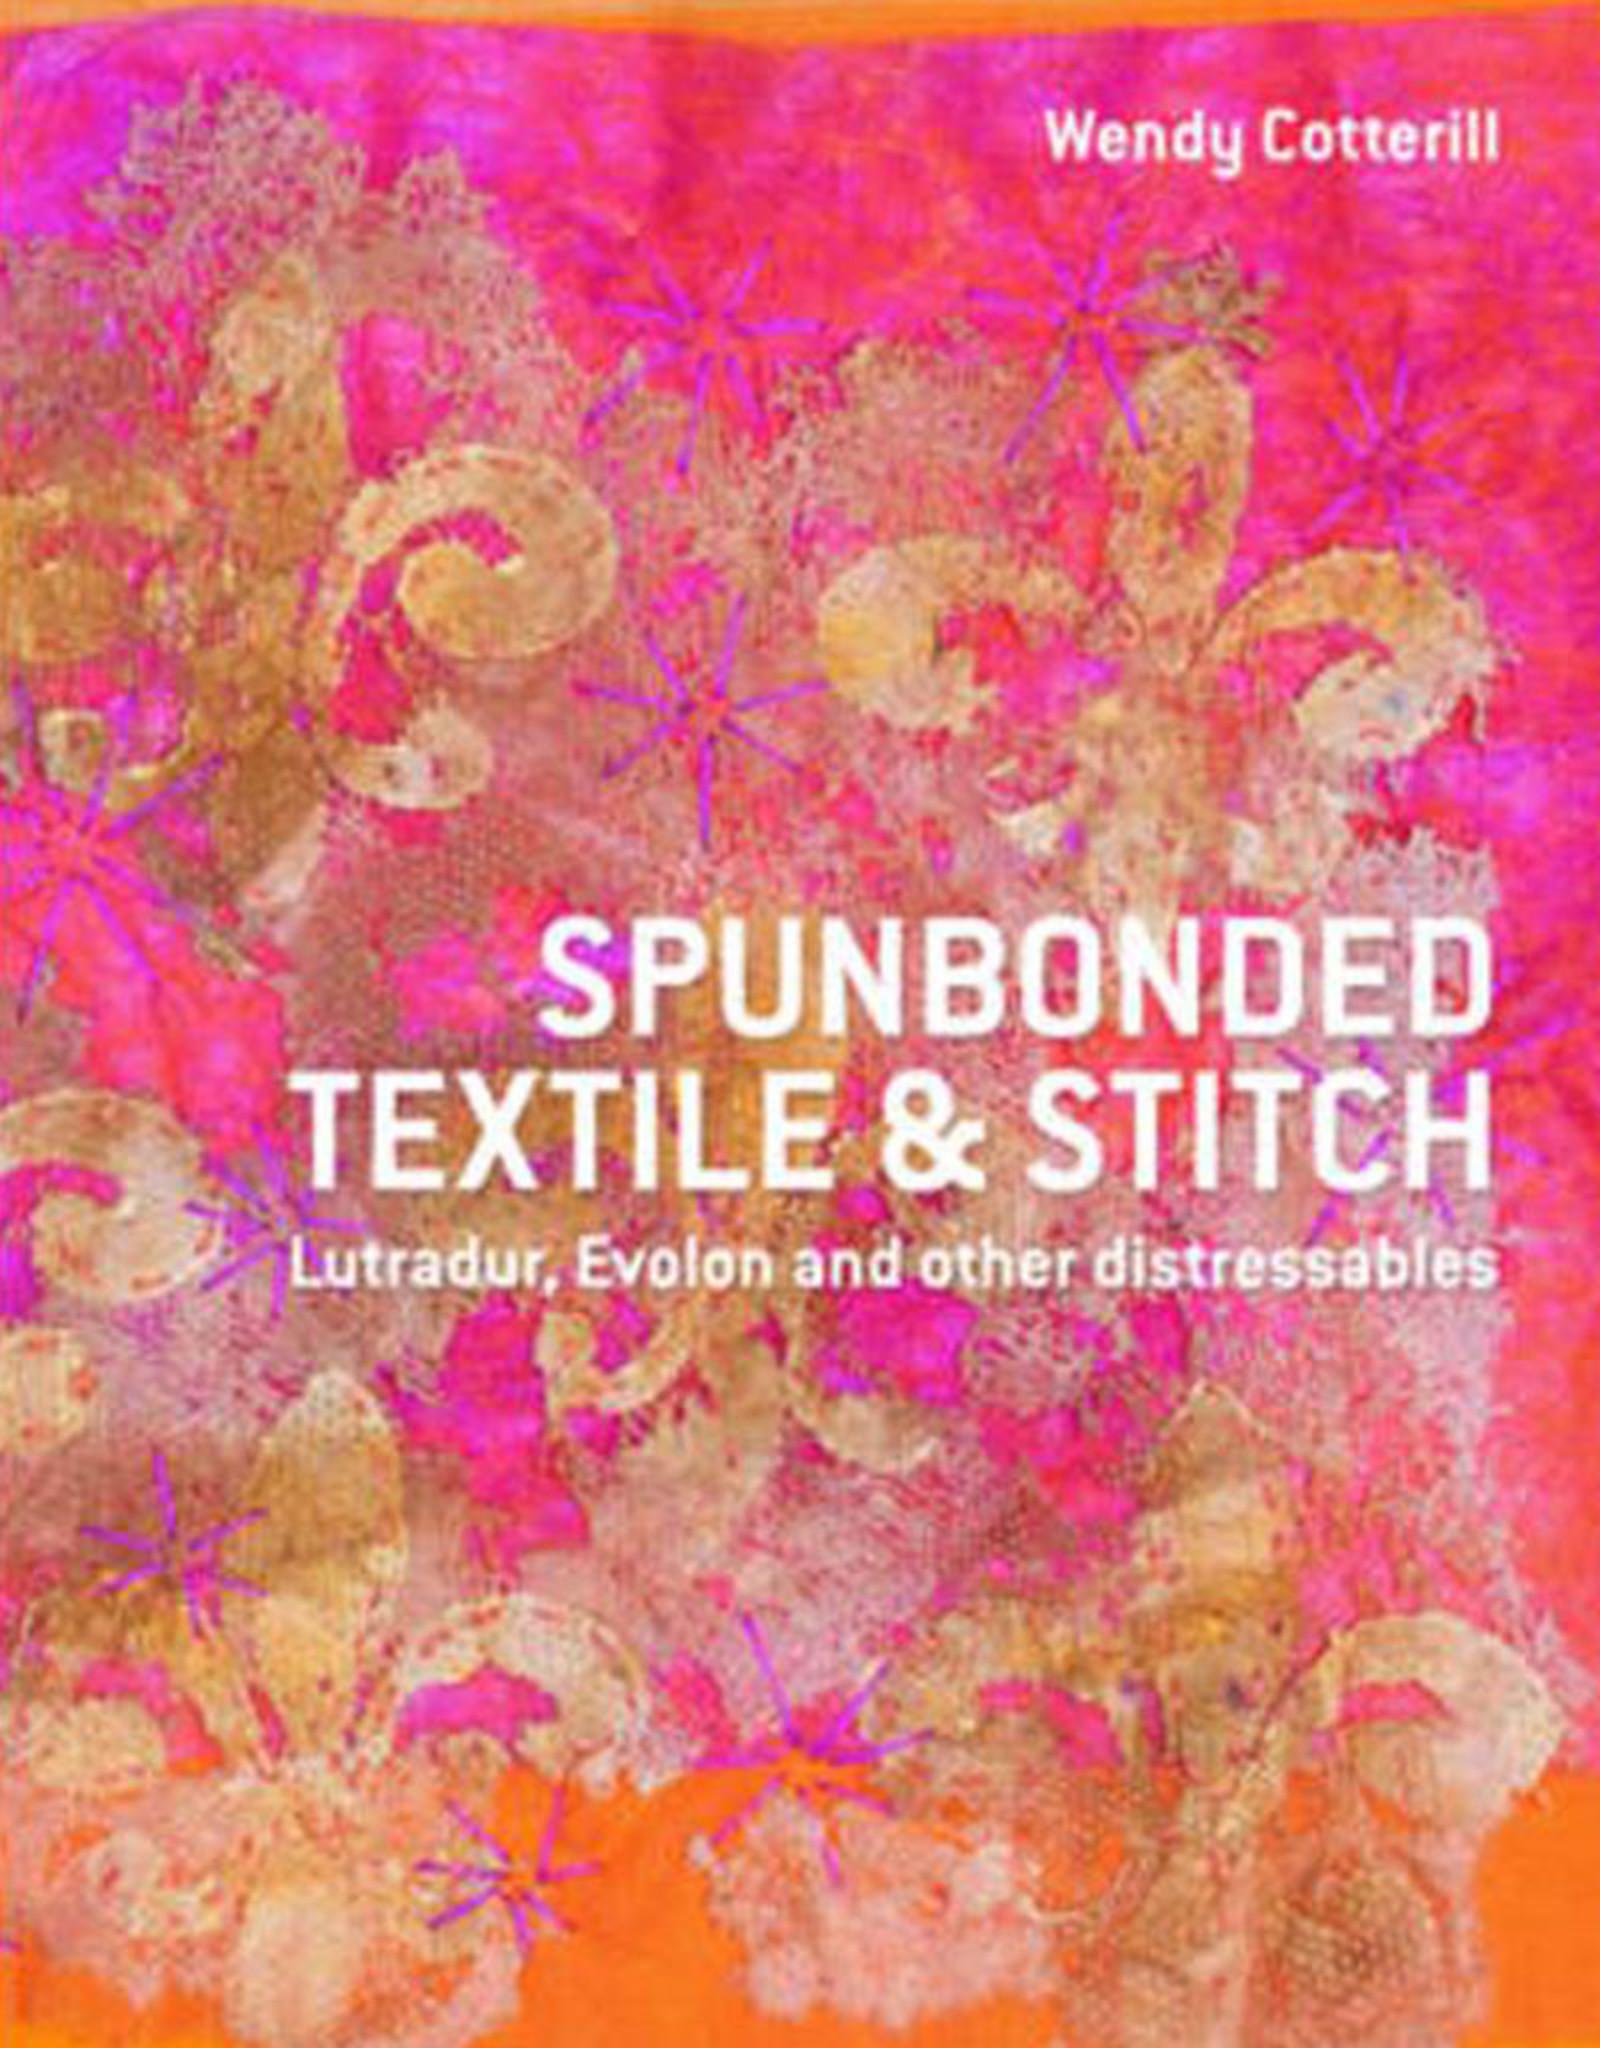 Spunbonded Textile & Stitch / Wendy Cotterill